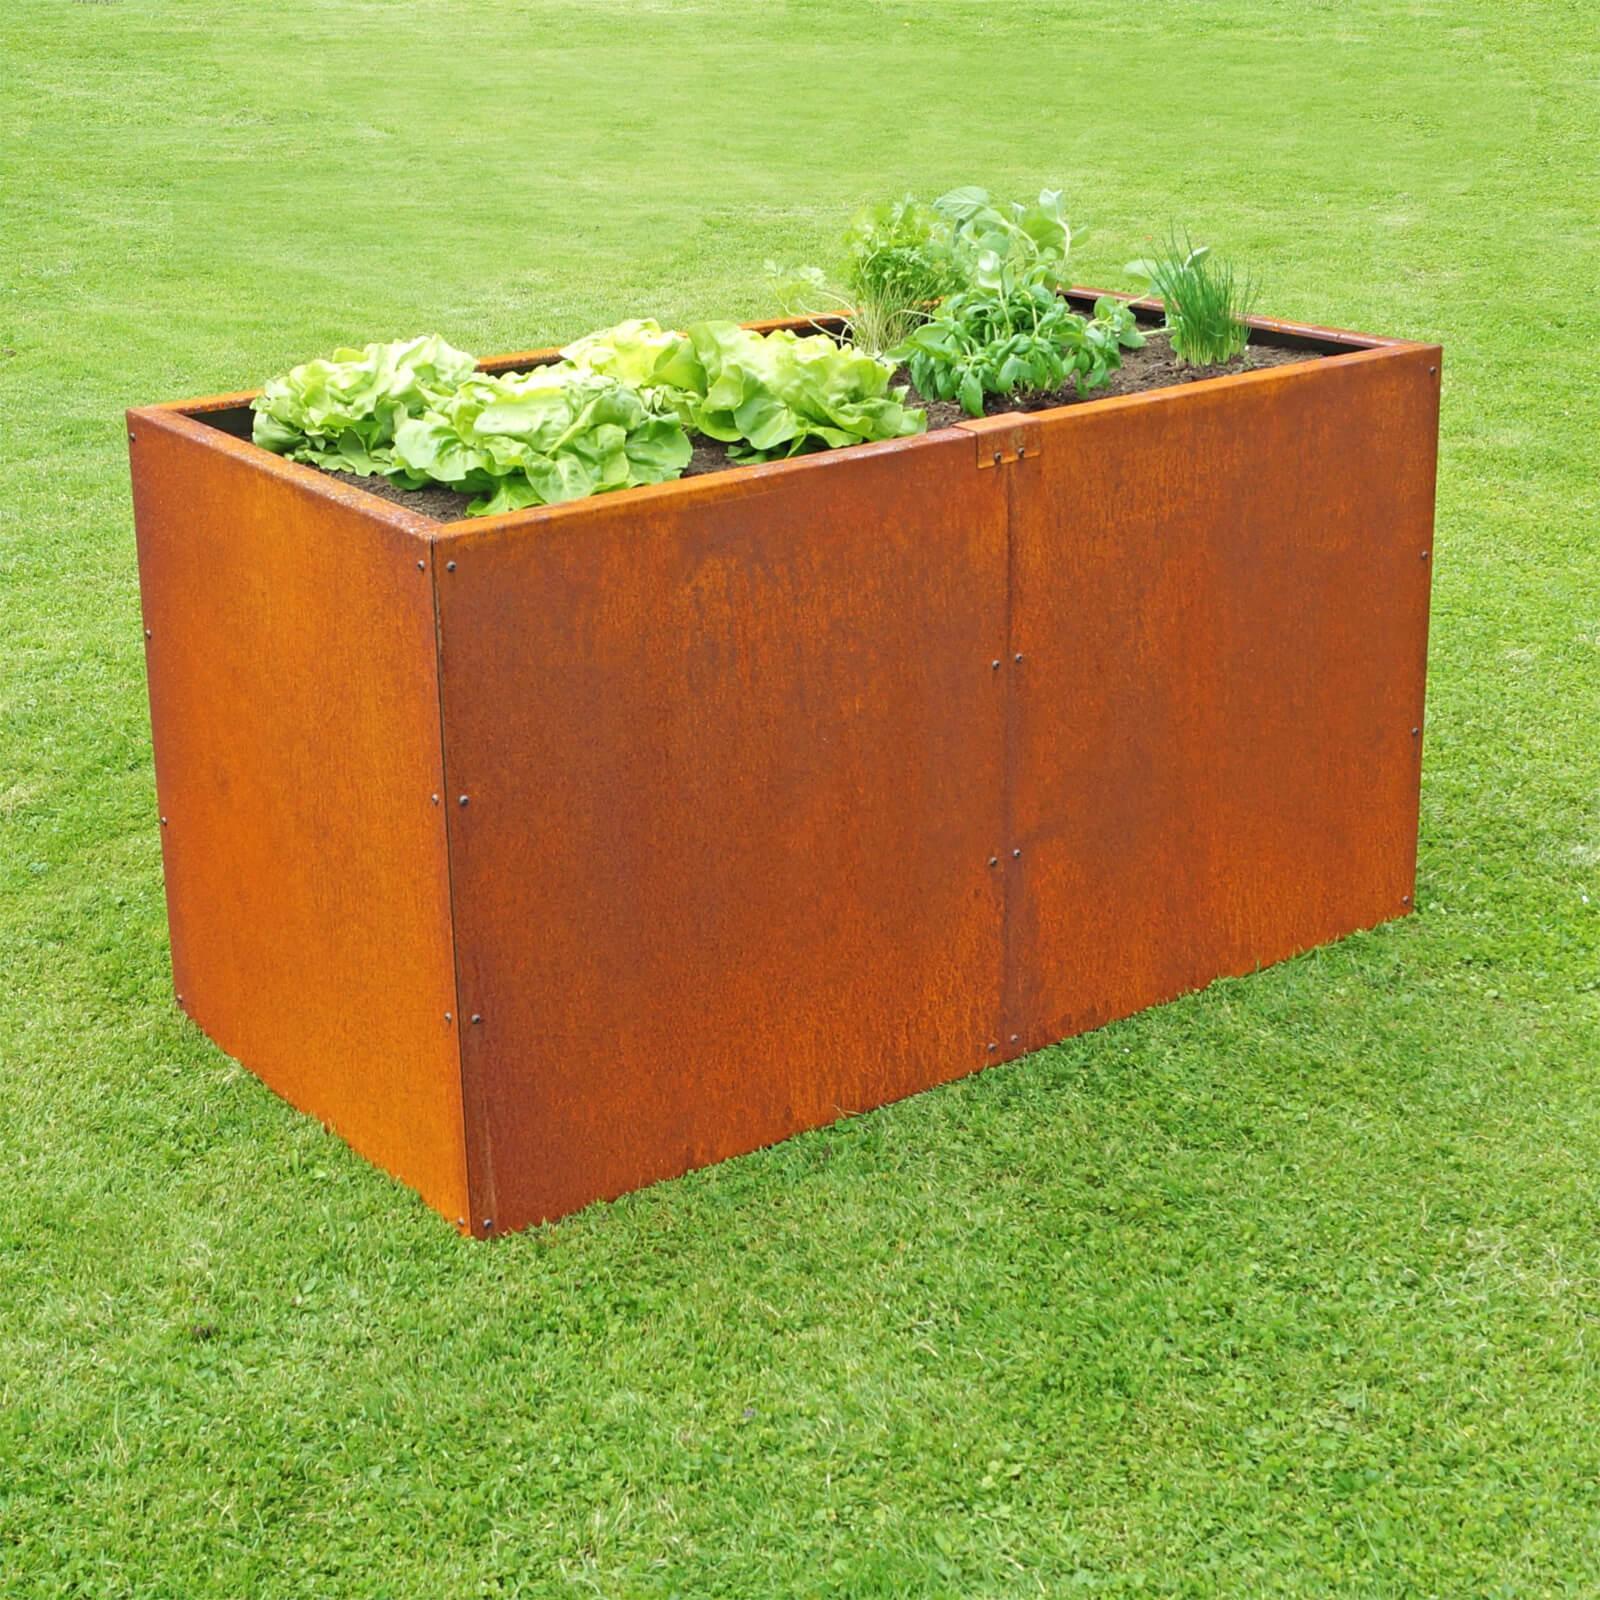 prima terra metall hochbeet edelrost beet h he 78 cm. Black Bedroom Furniture Sets. Home Design Ideas